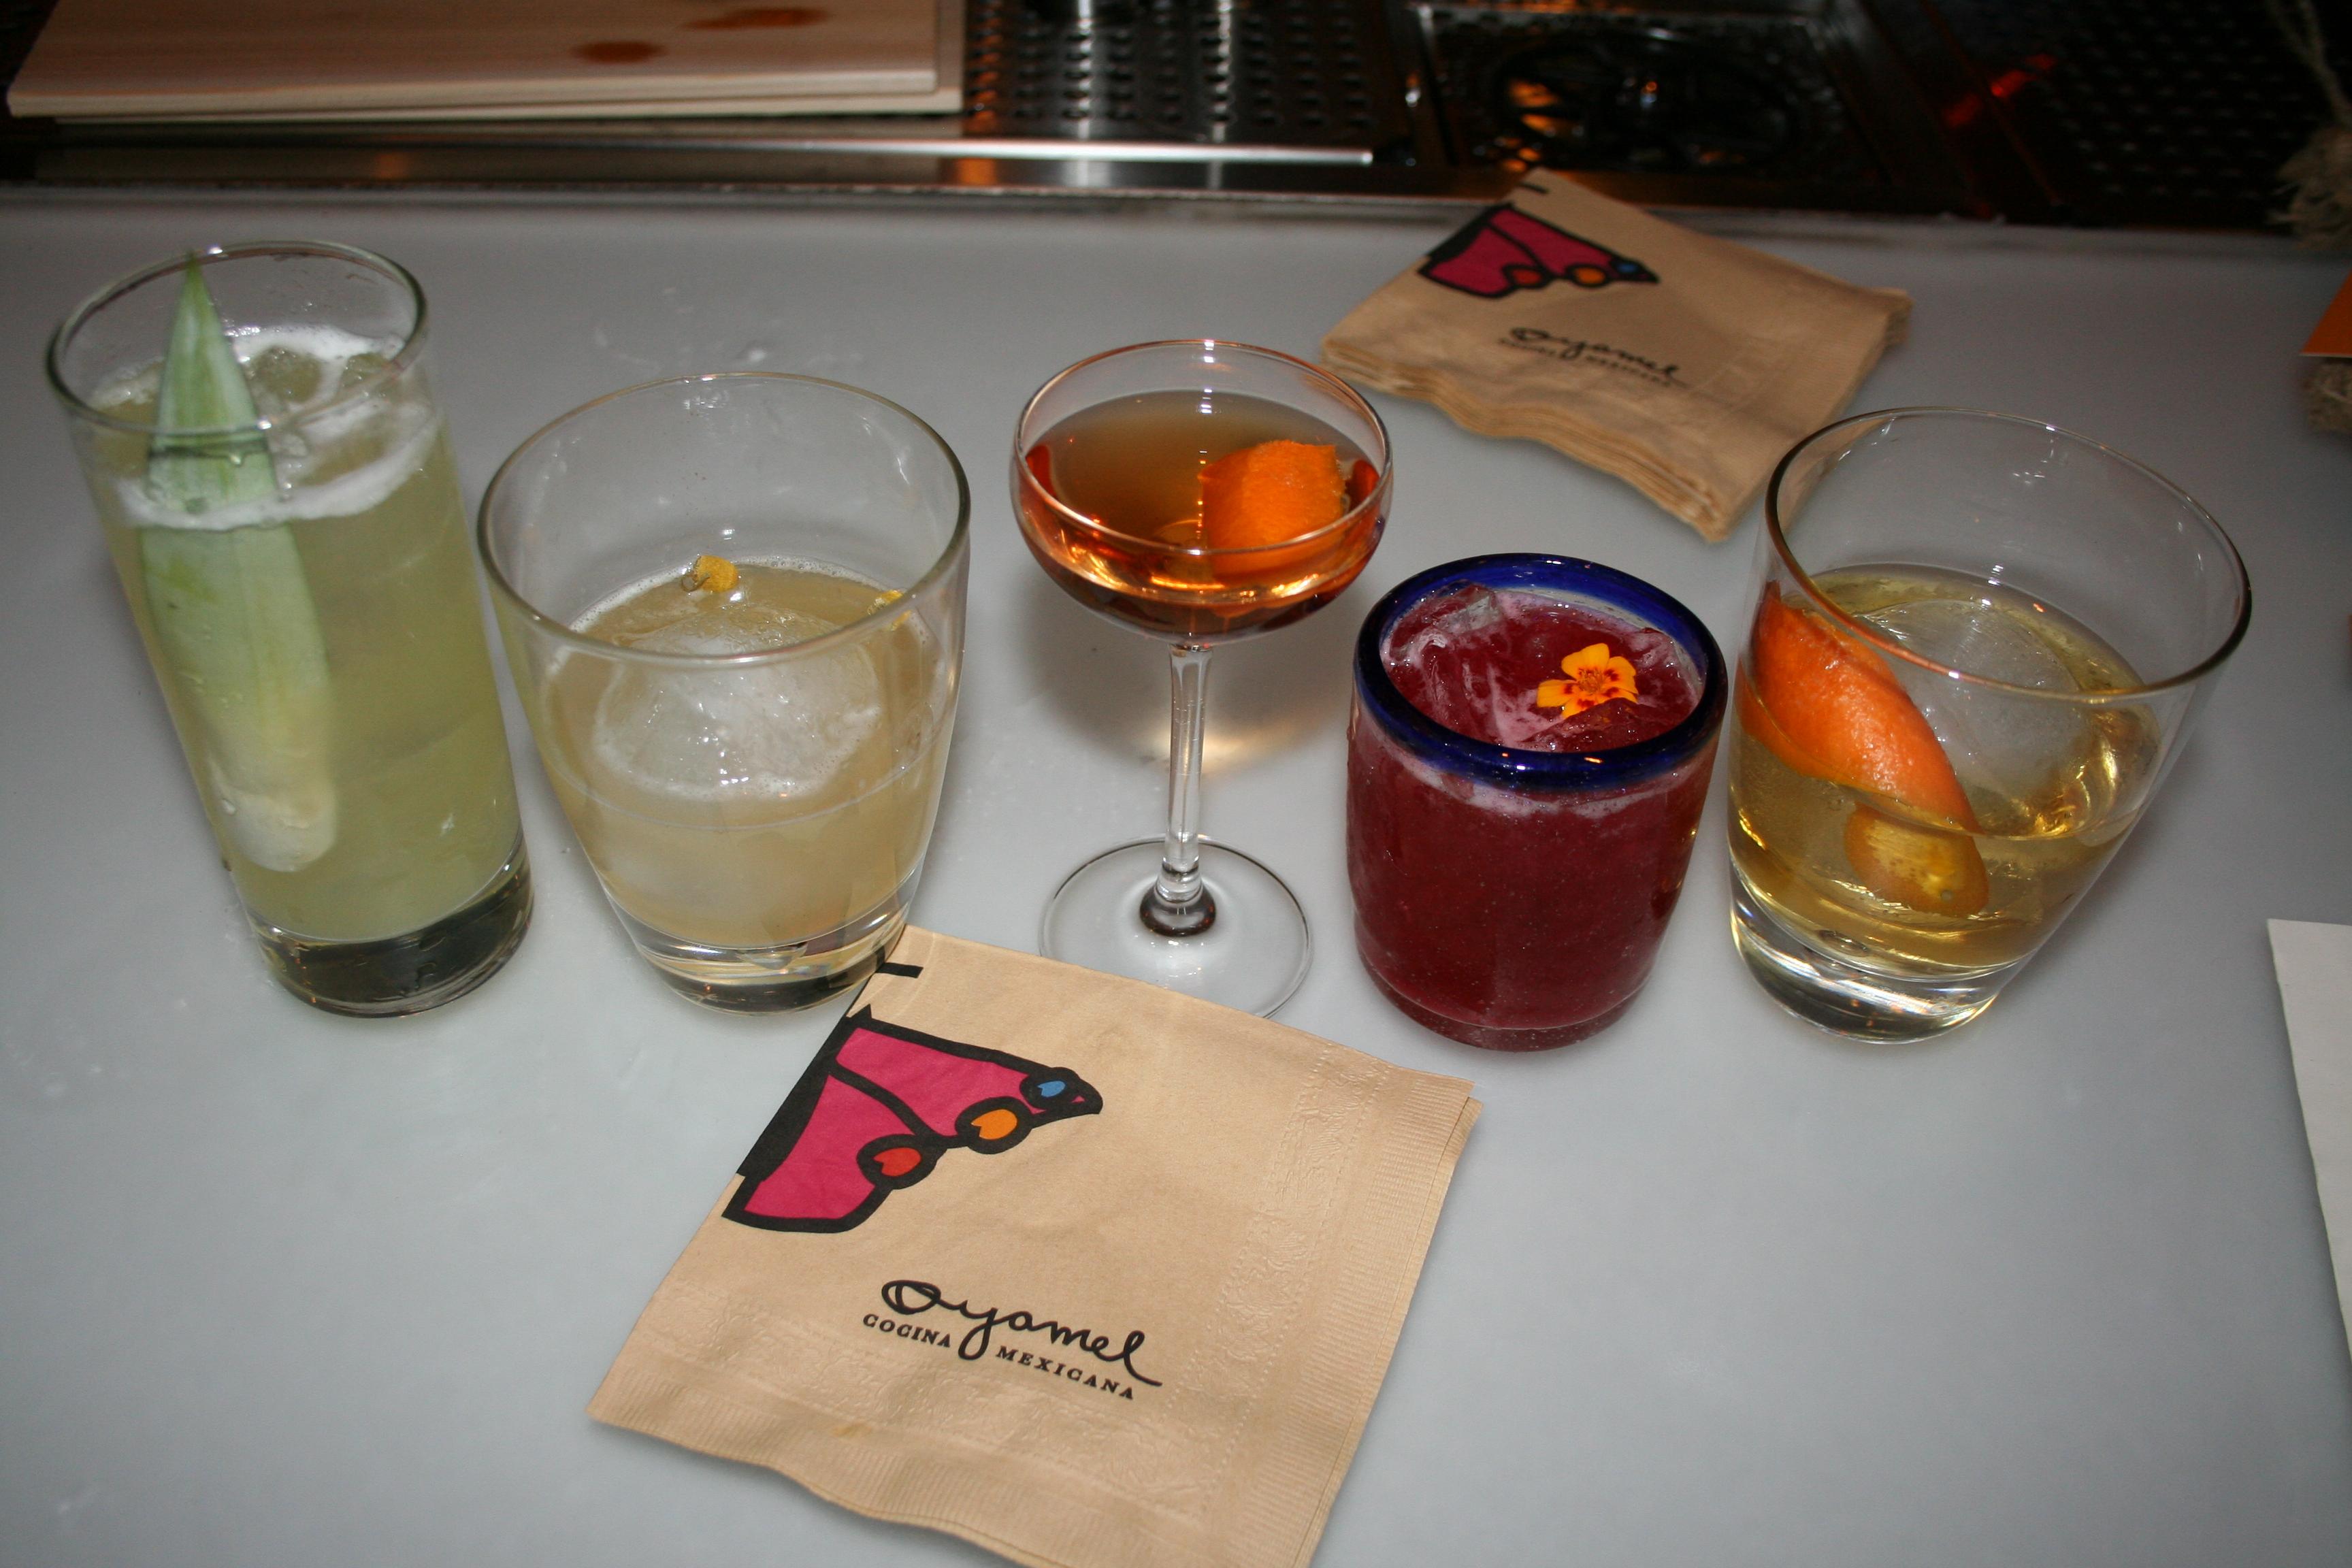 Drink specials include (l to r) the miramar, the naranja dulce limón partido, the el jaracho, the rosa de oaxaca and the agave en leña. (Photo: Mark Heckathorn/DC on Heels)